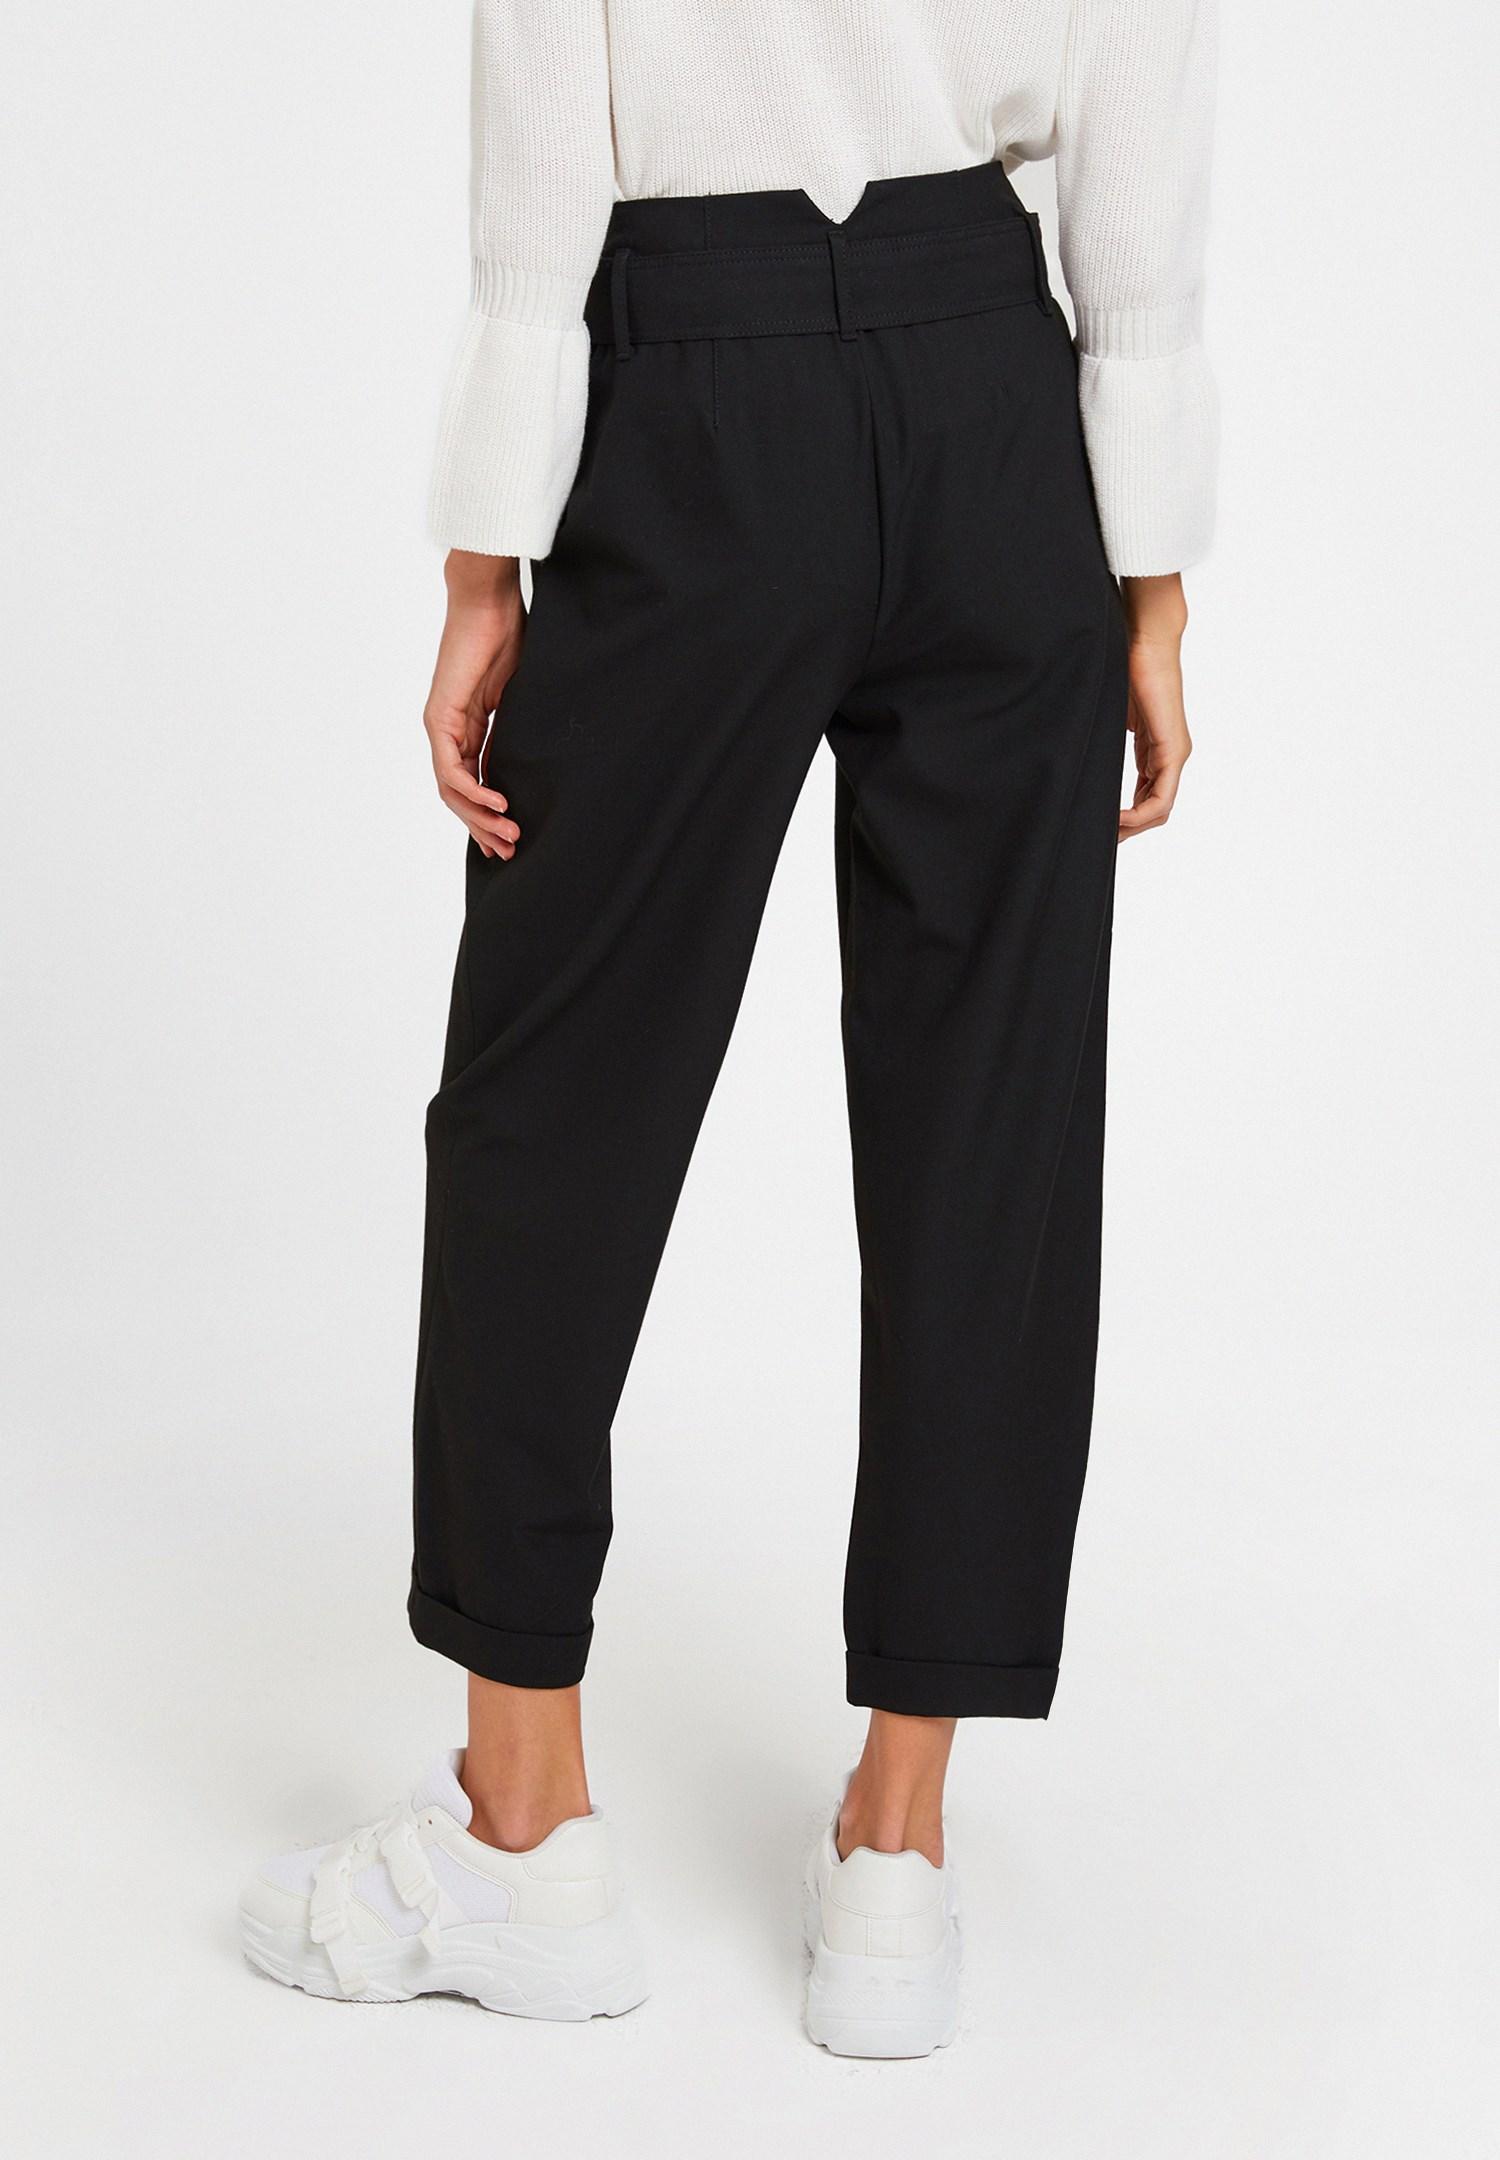 Bayan Siyah Kemerli Bol Pantolon